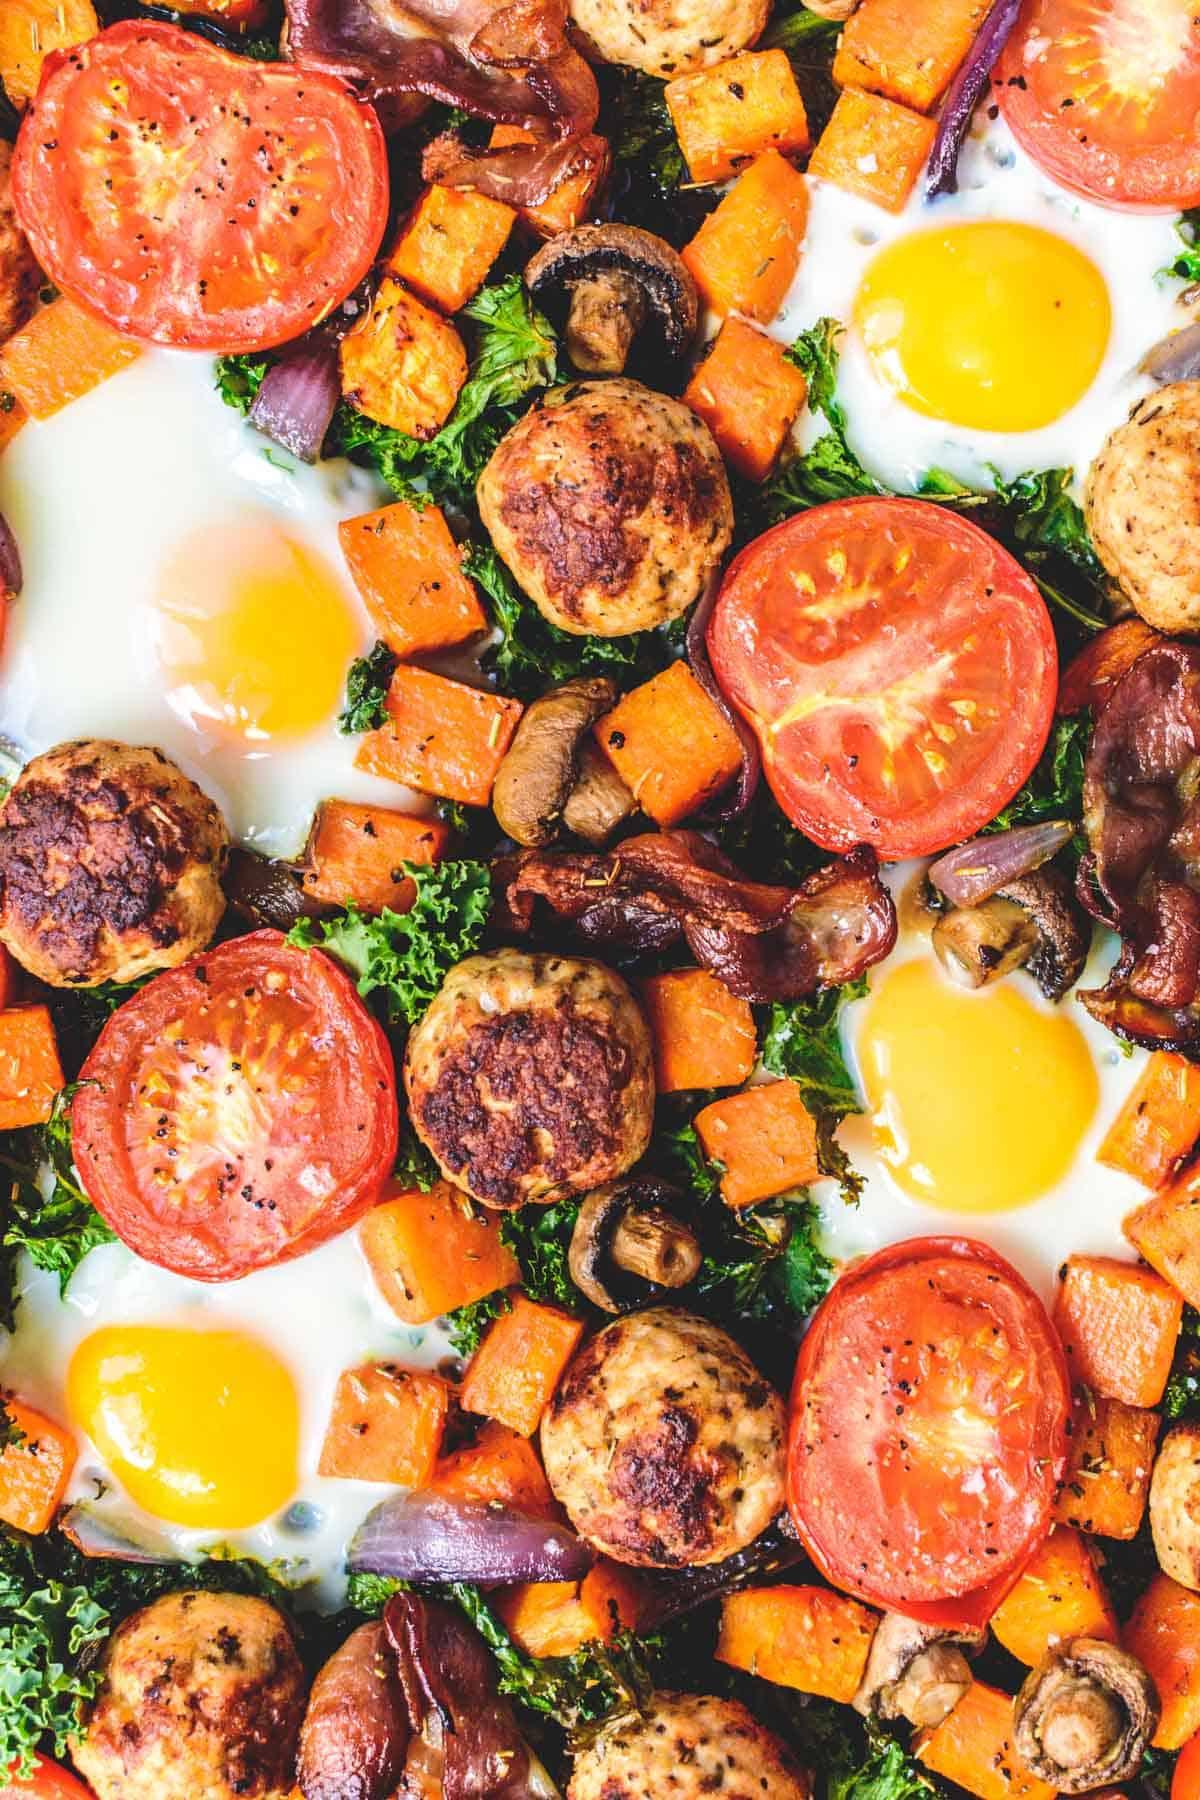 Eggs, bacon, mushrooms, tomatoes, kale, turkey sausage on baking tray